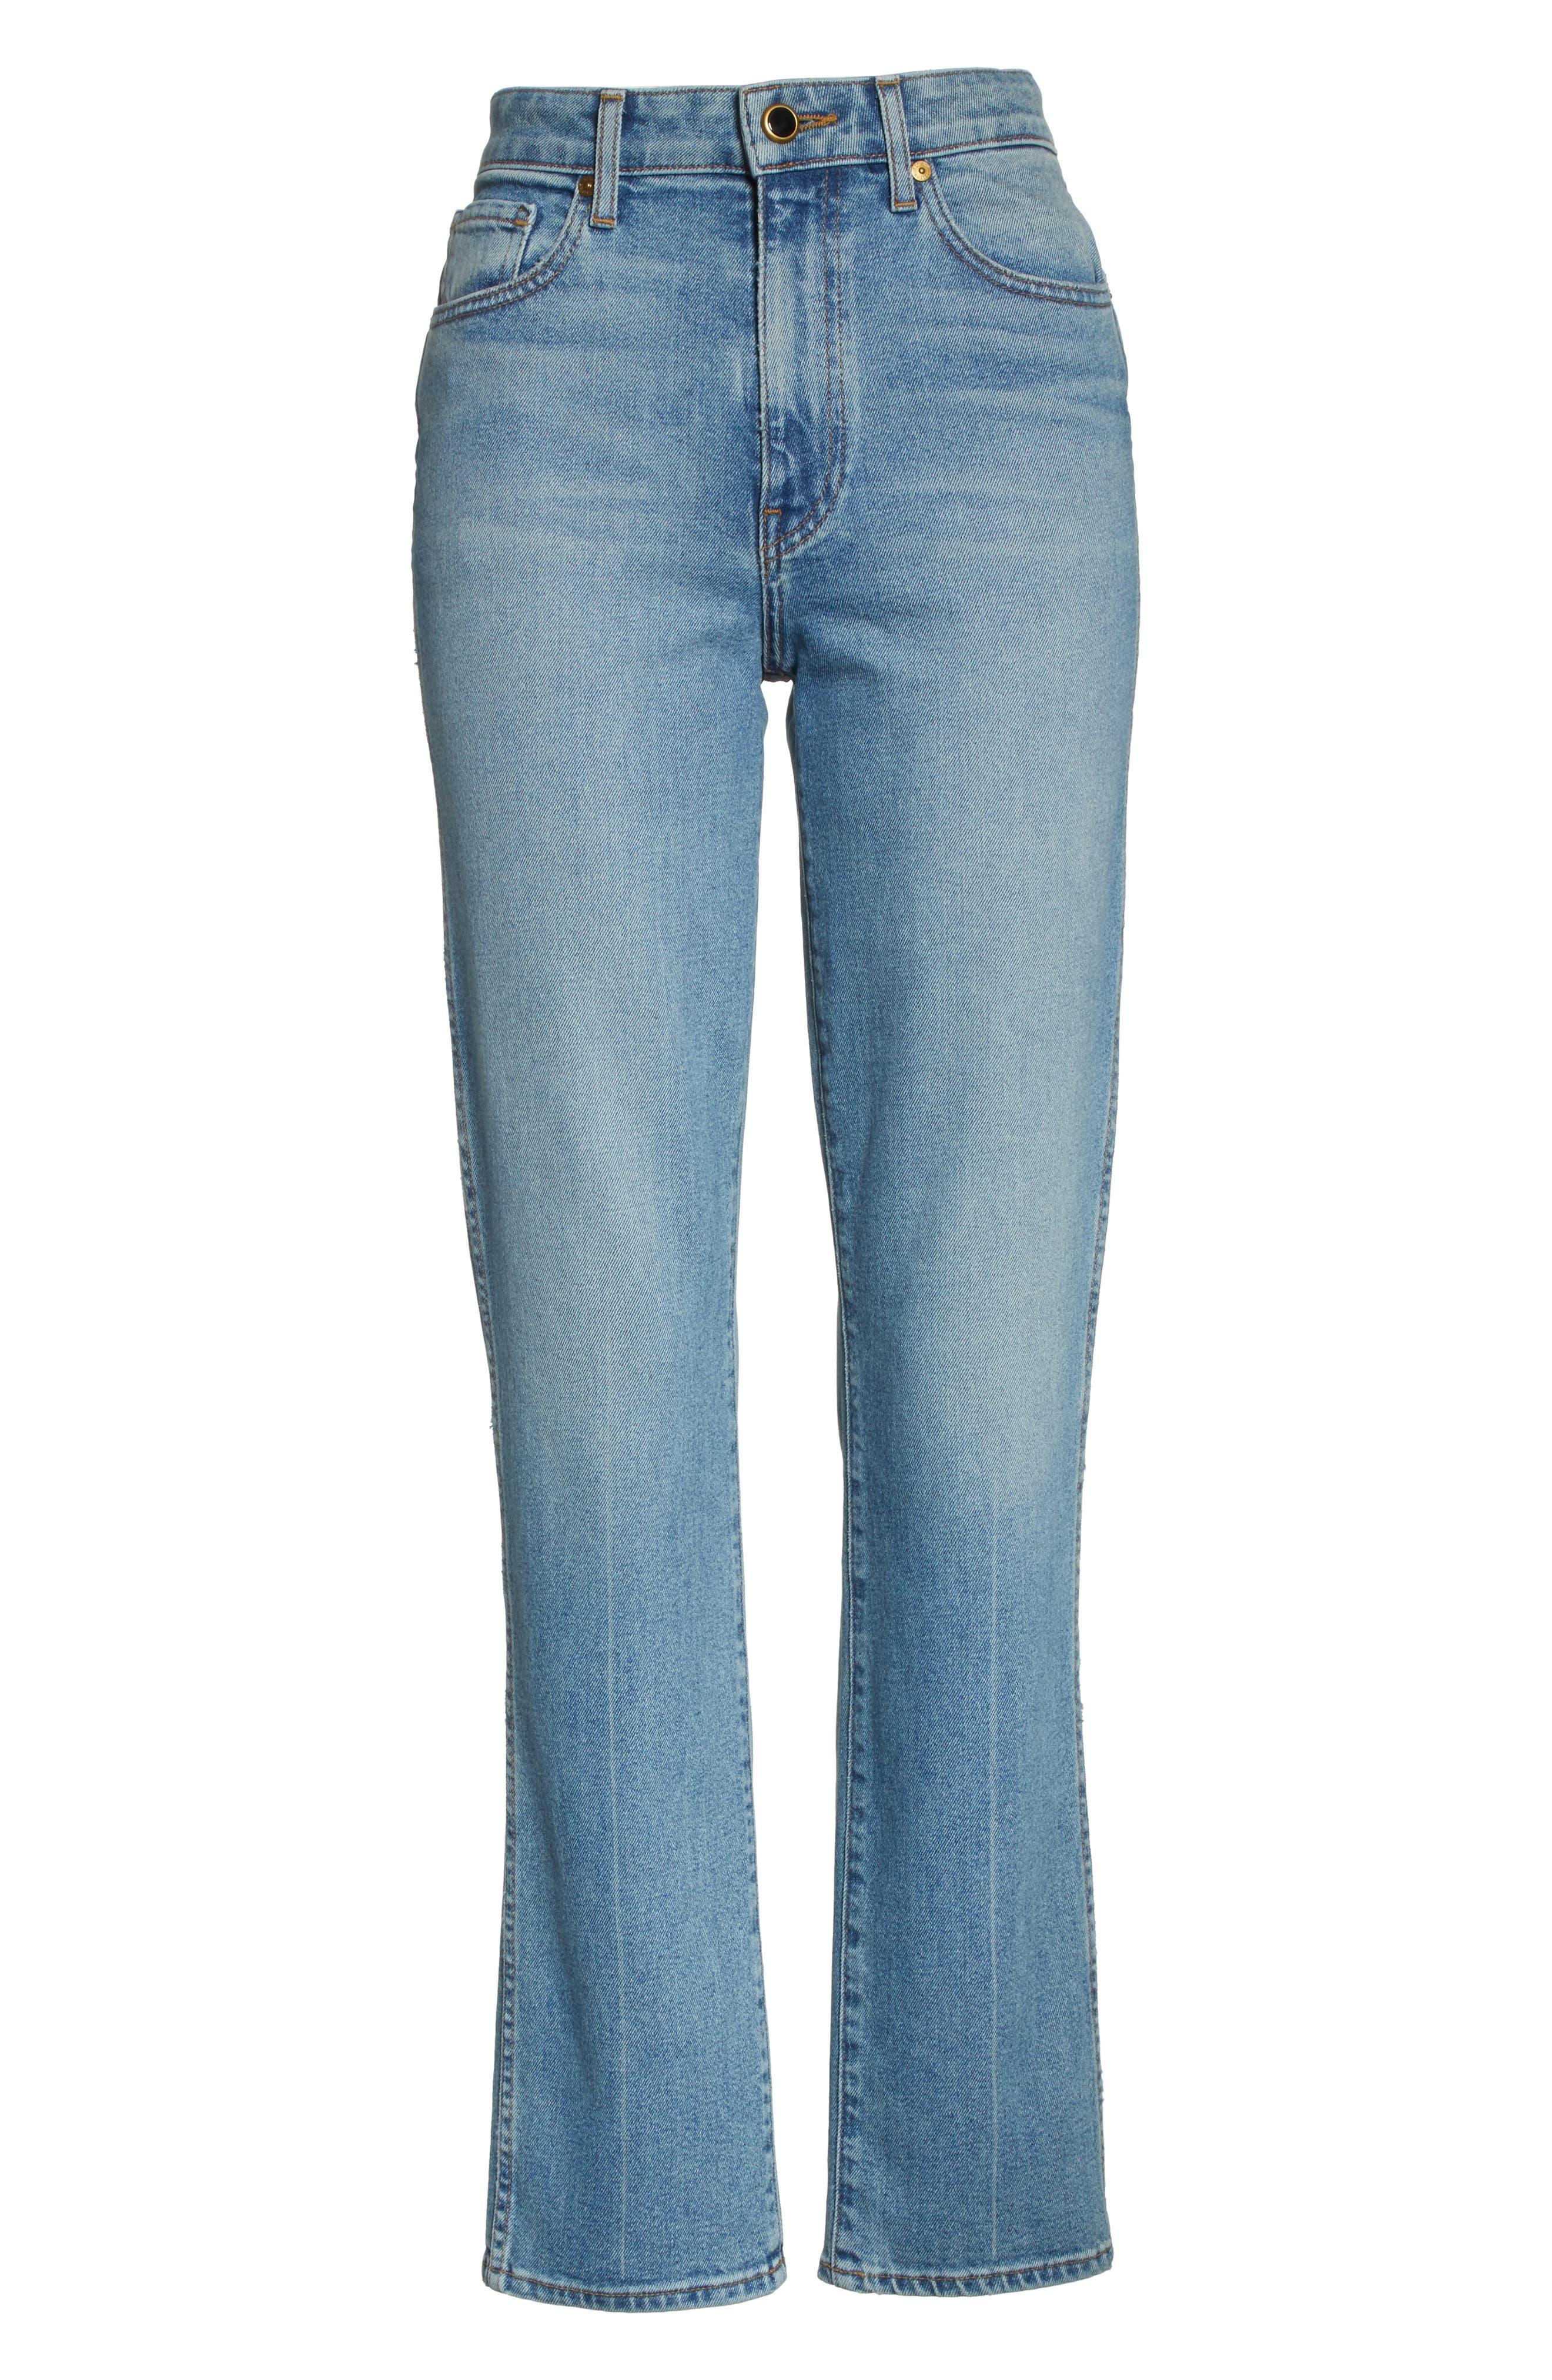 Victoria Straight Leg Jeans,                             Alternate thumbnail 7, color,                             Medium Crease